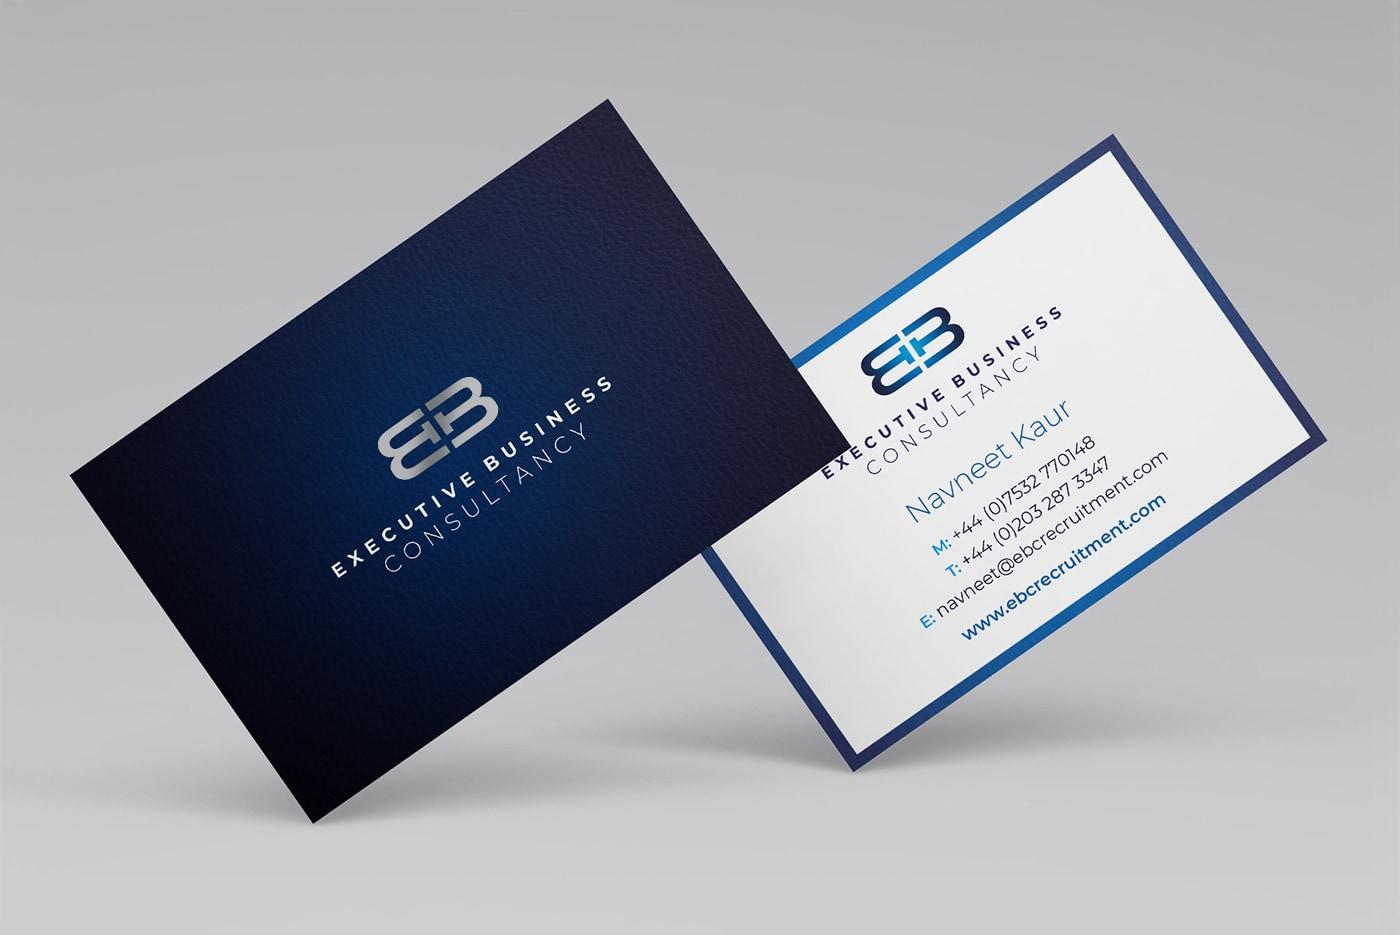 Exec Business Consultancy